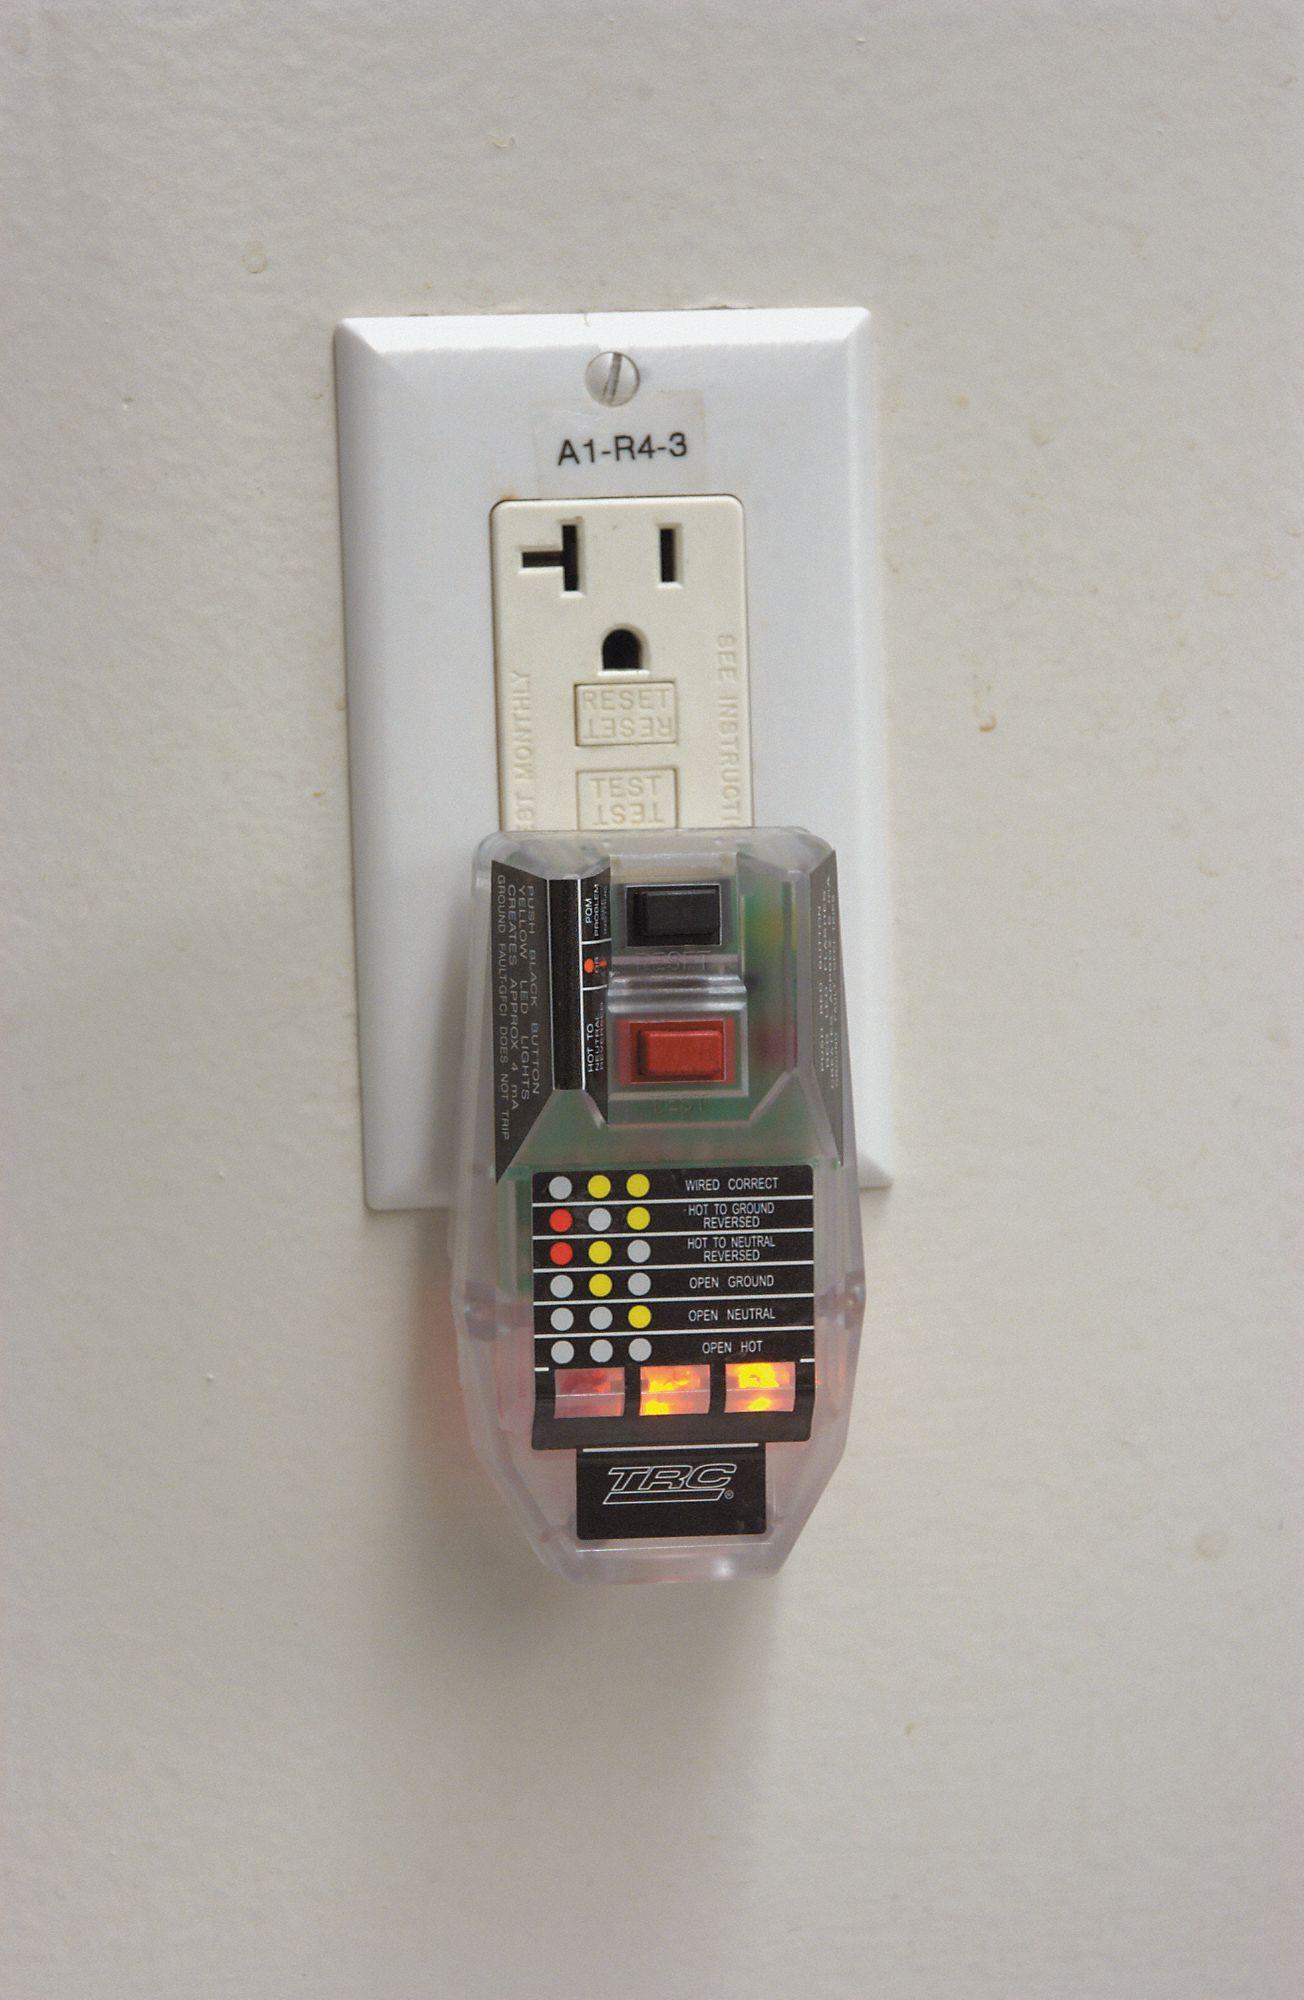 Trc Gfci Outlet Tester Tech Research 8xey7 30090 012 6 Grainger Vs Circuit Breaker